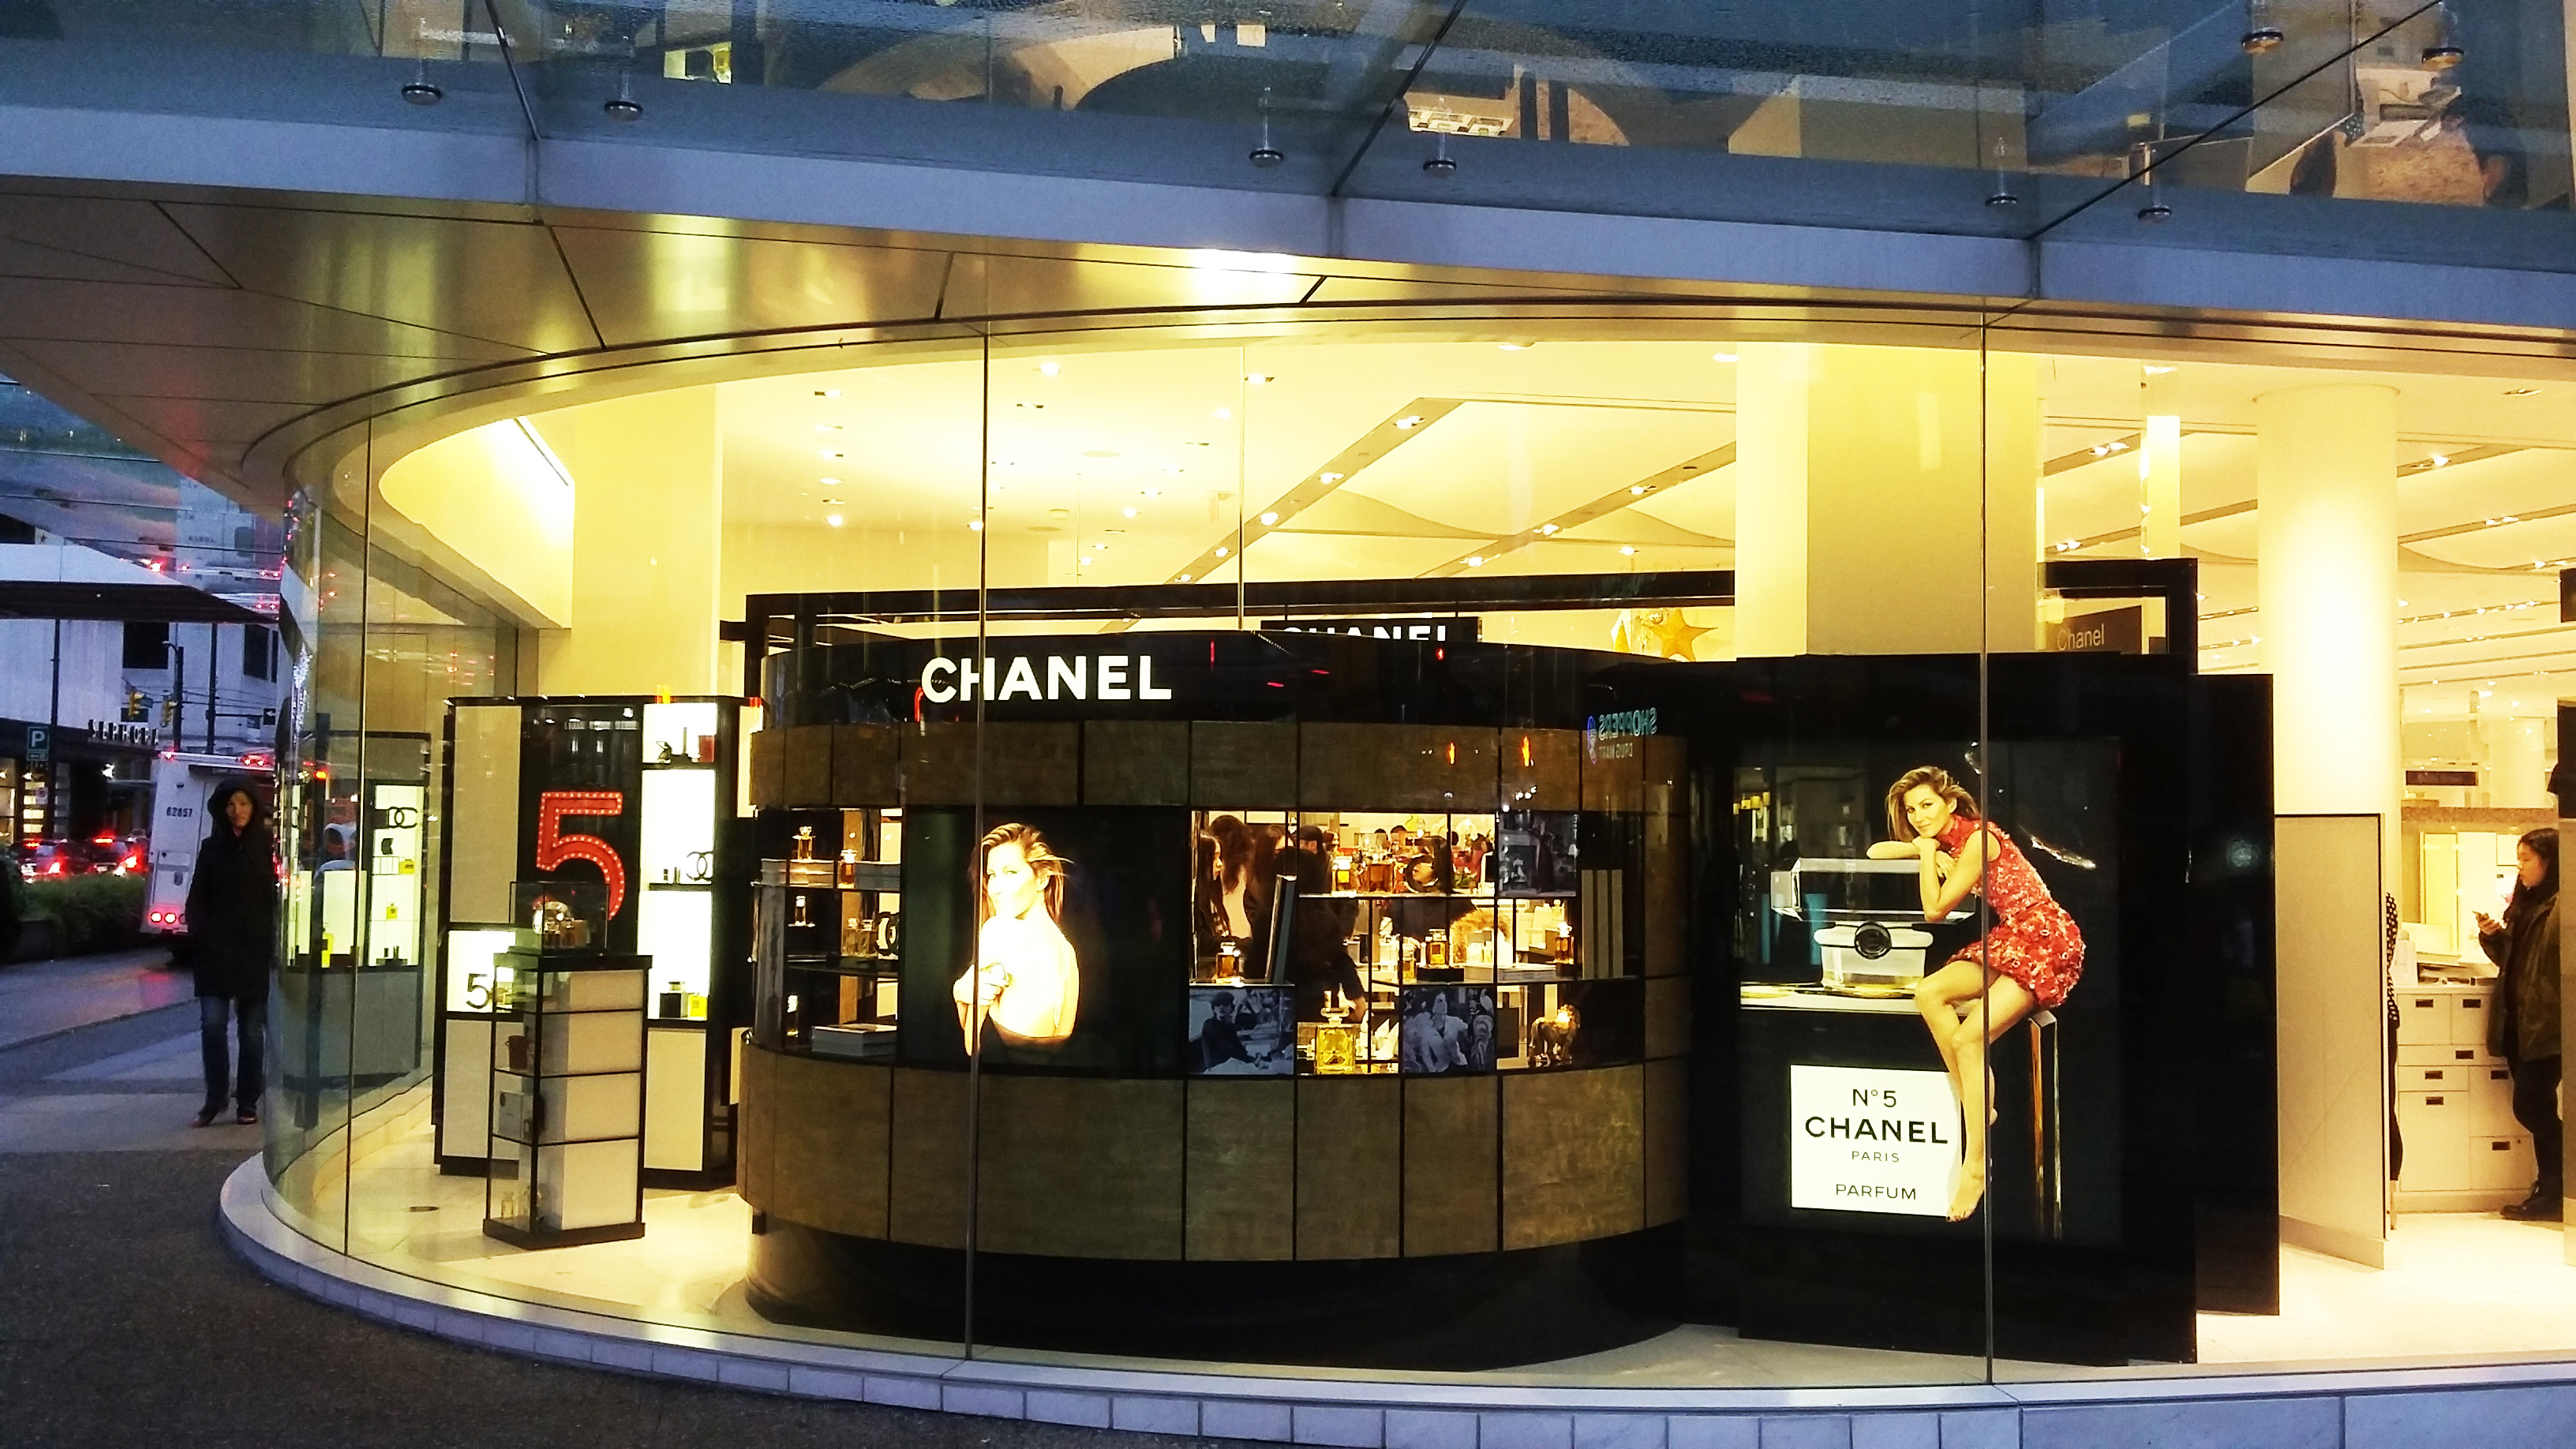 Chanel, Holt Renfrew, Helen Siwak, Luxury Zone, VancityBuzz, helen siwak, theclosetyvr, ecoluxluv, fblogger, blogger, styewriter, vancouver, yvr, vancity, fashion, stylist, ecoluxury